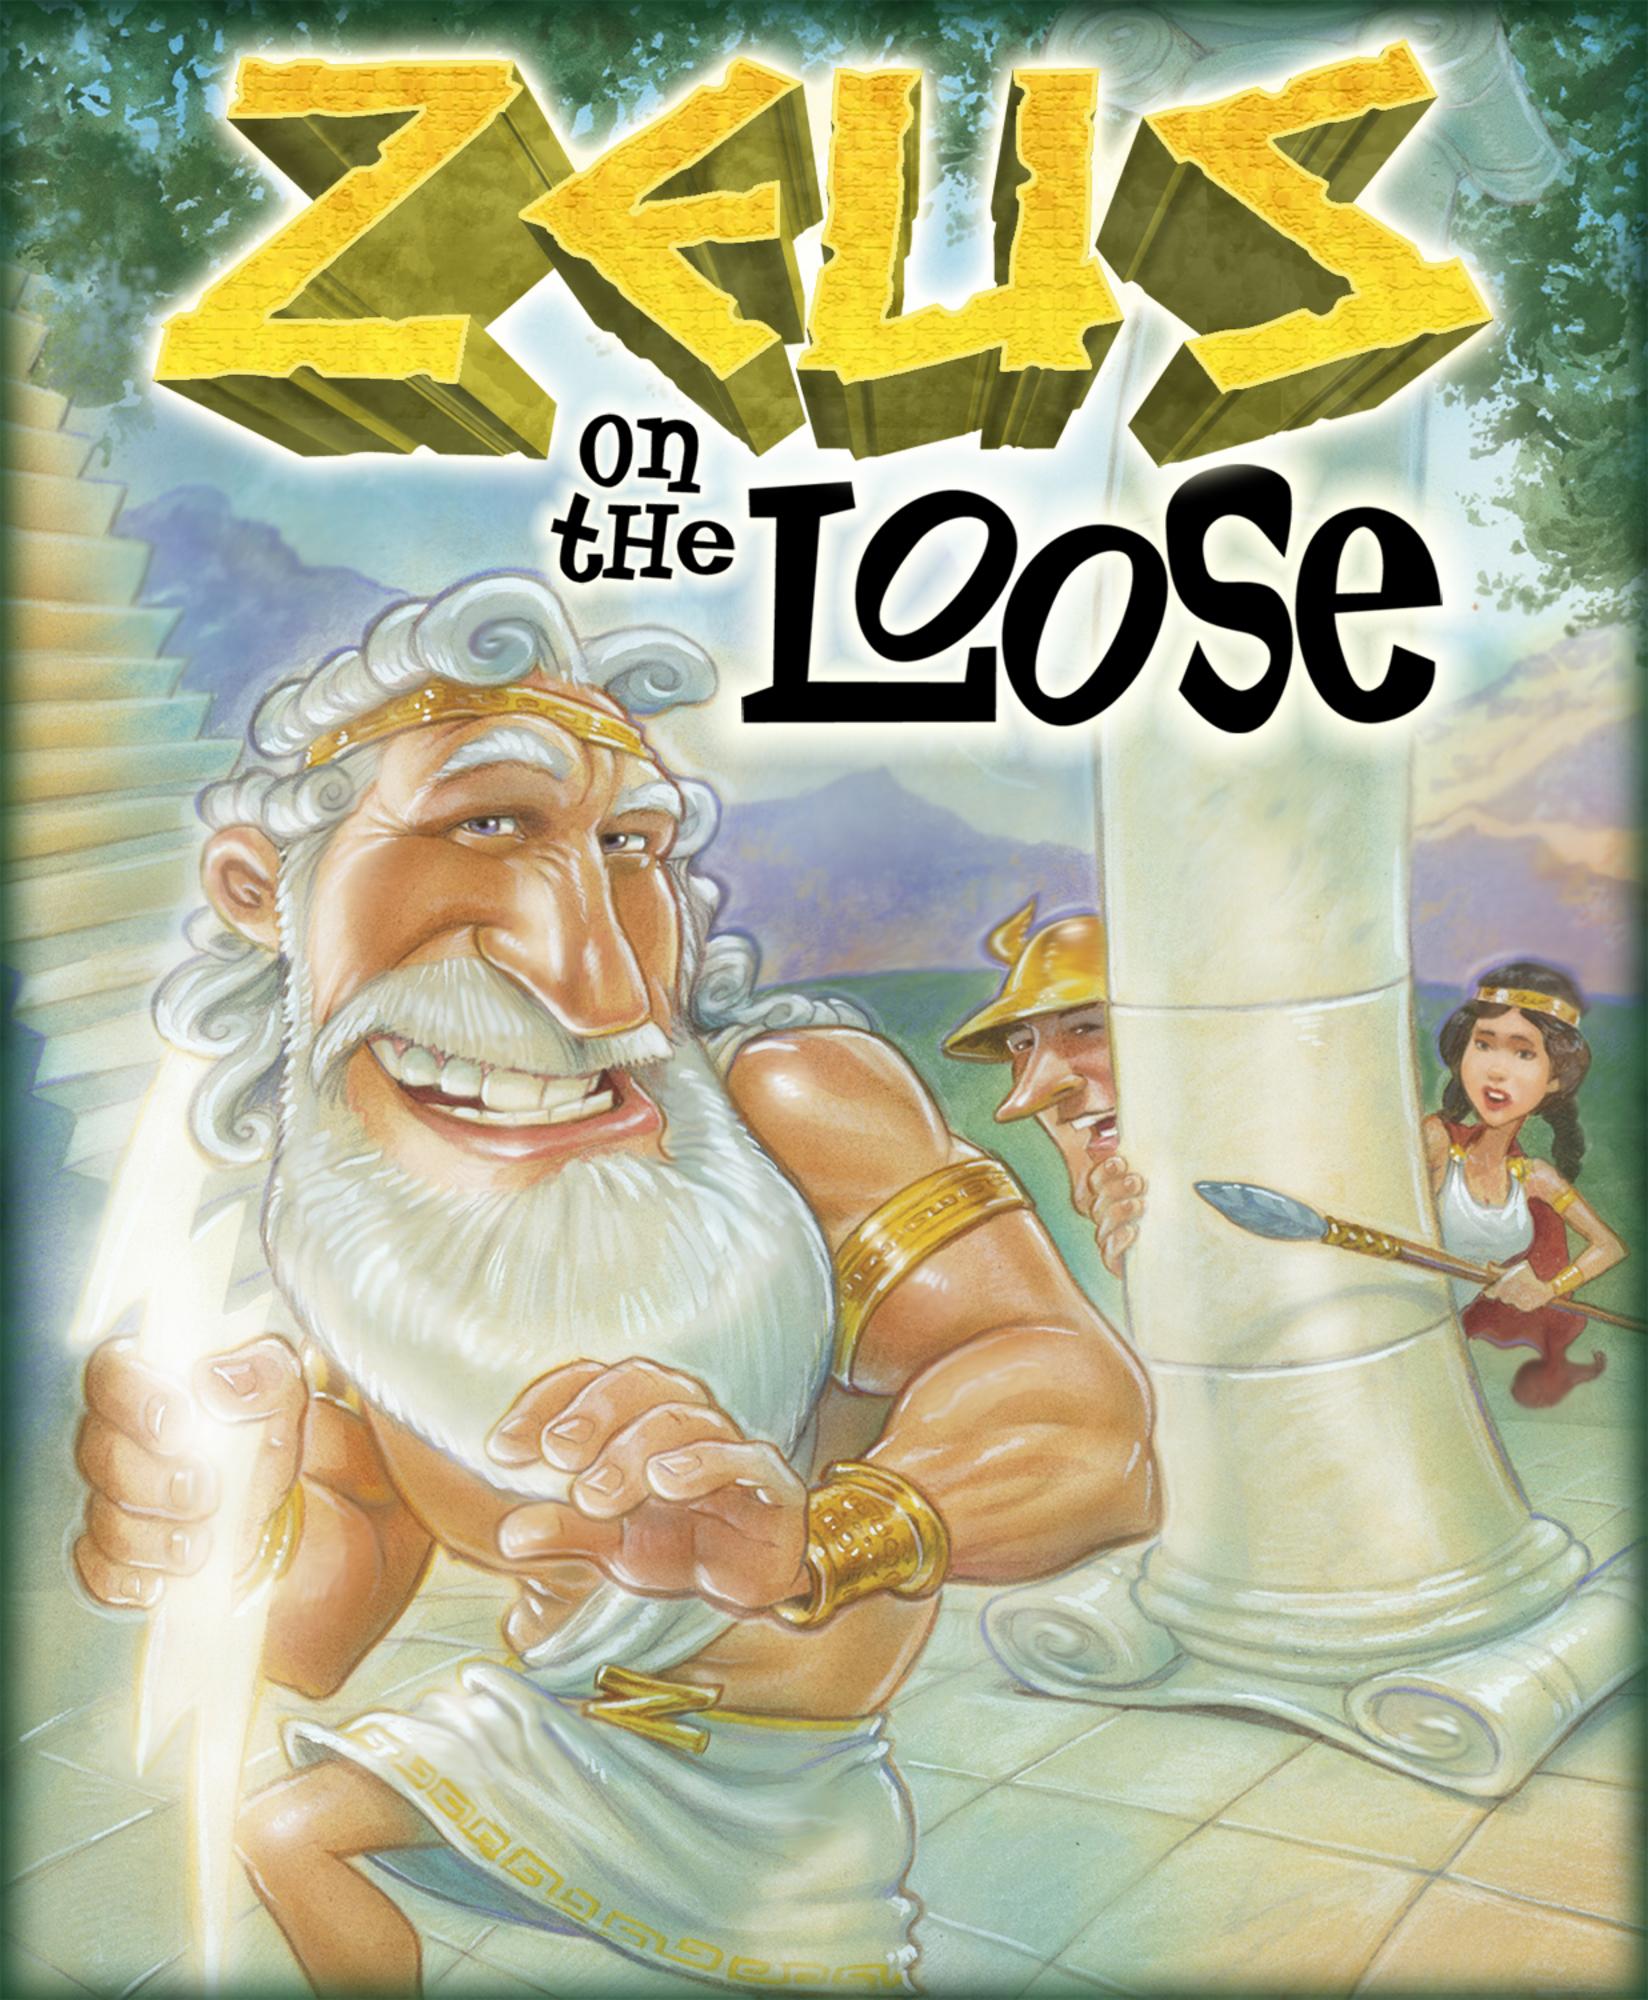 Zeus on the LooseTM